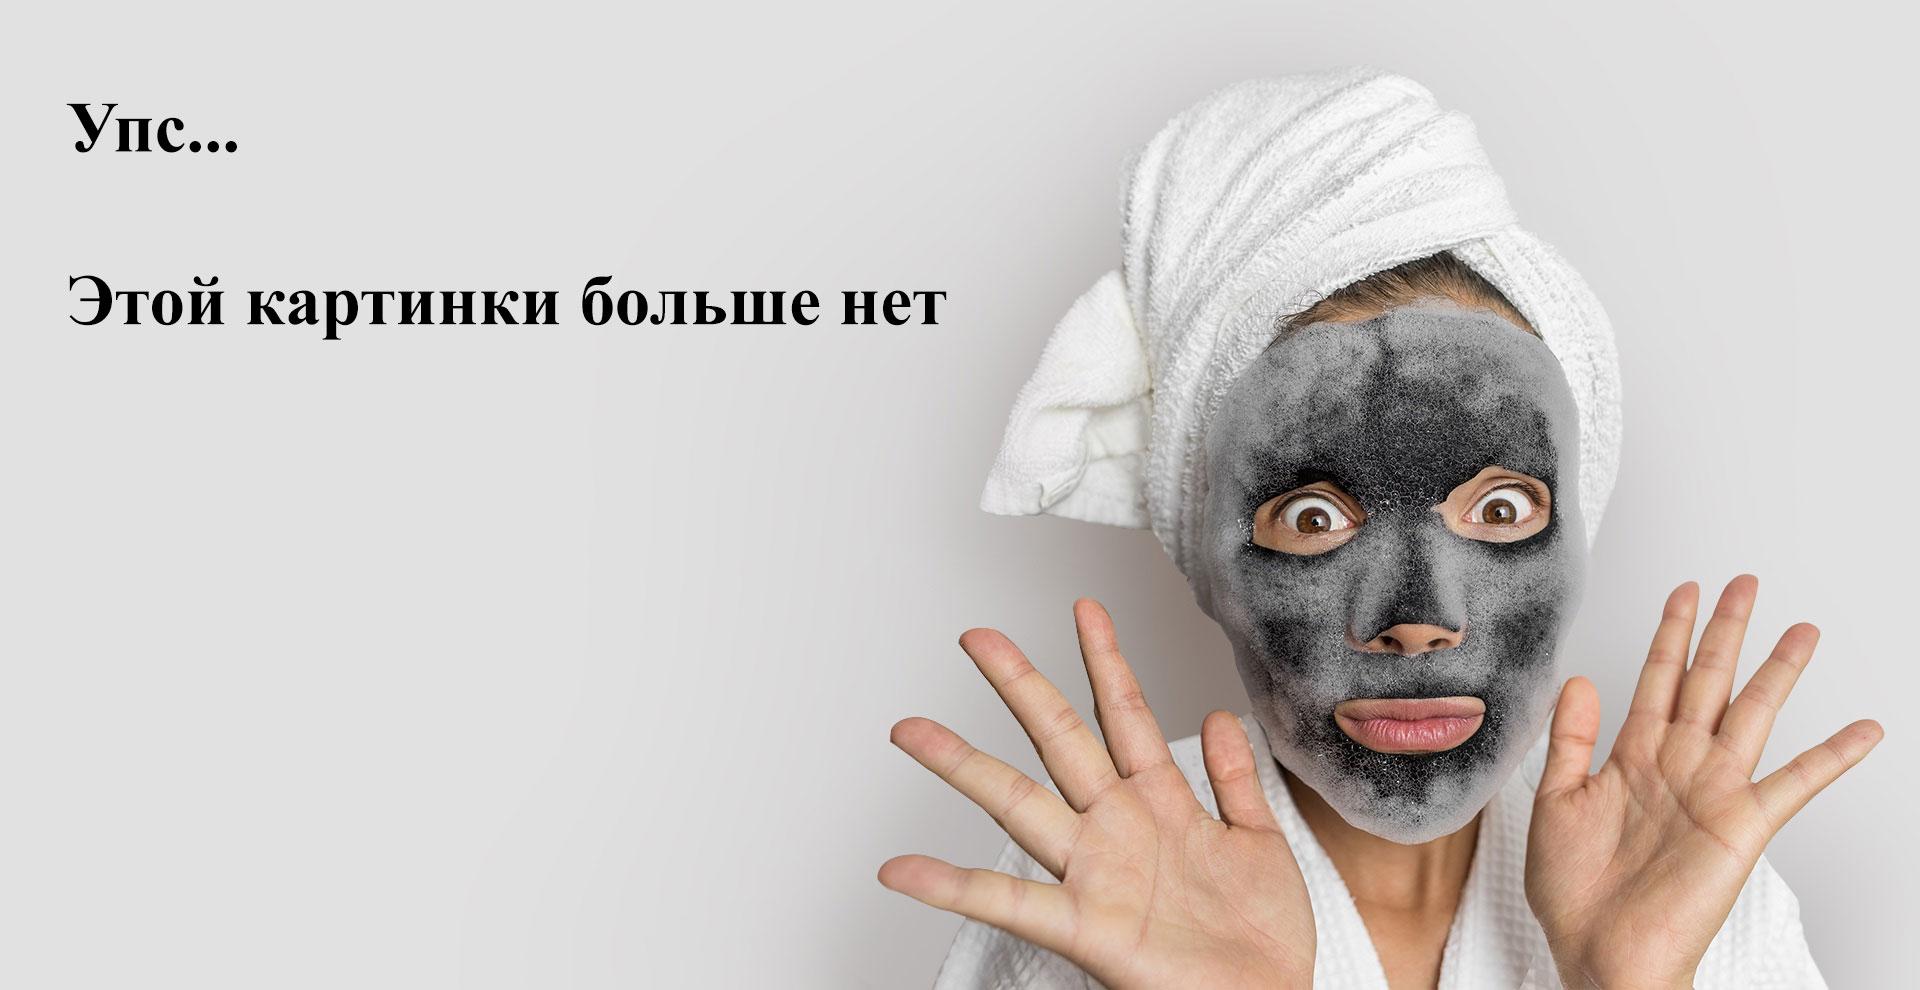 Patrisa Nail, Гель-лак «Стиль жизни» №432